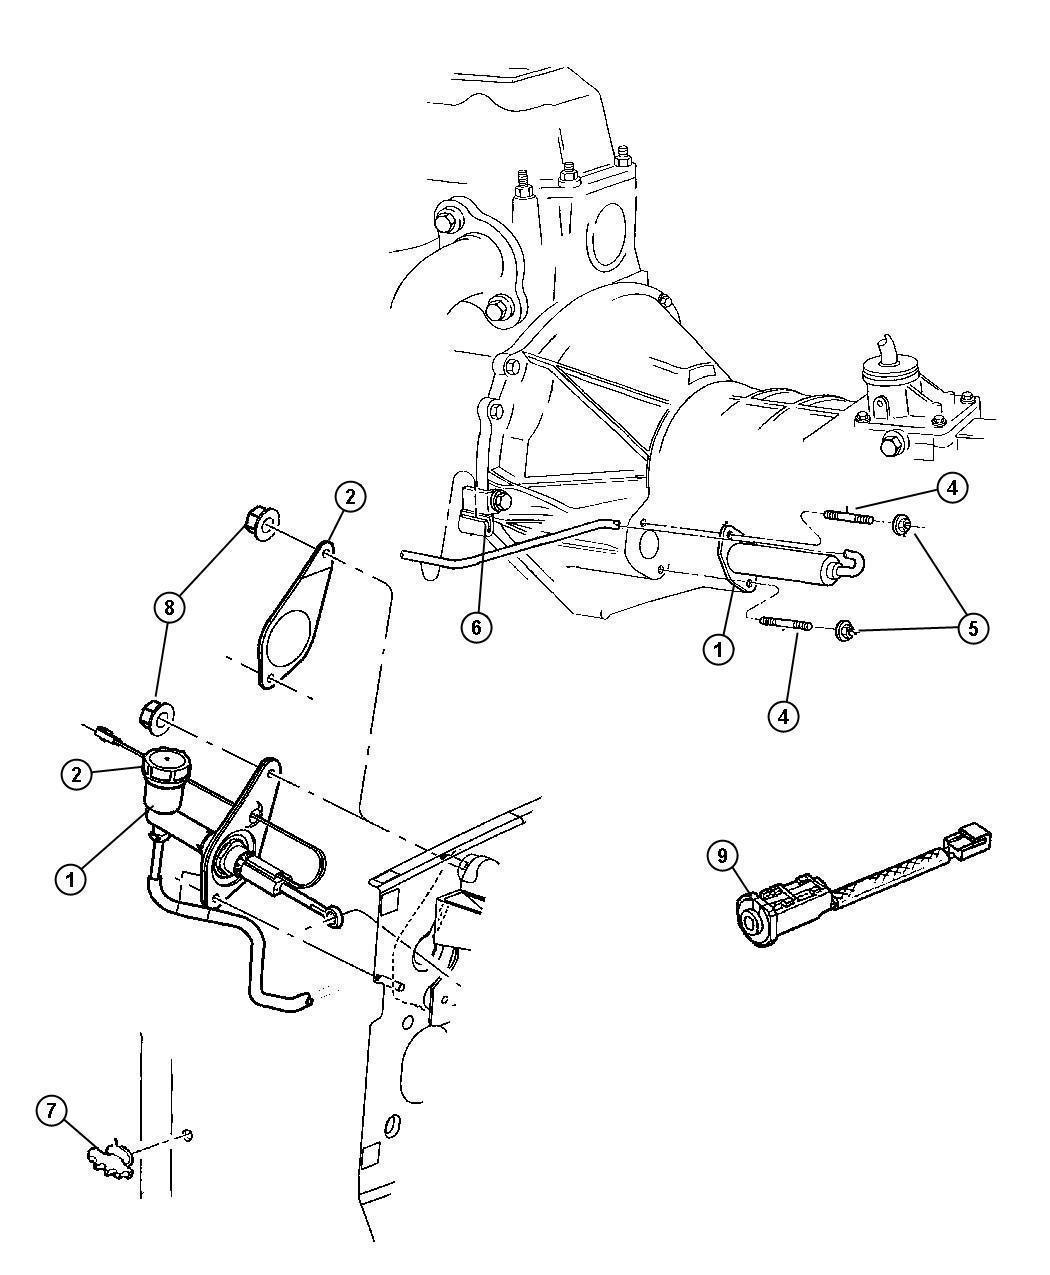 Jeep Liberty Hydraulic control. Clutch actuator